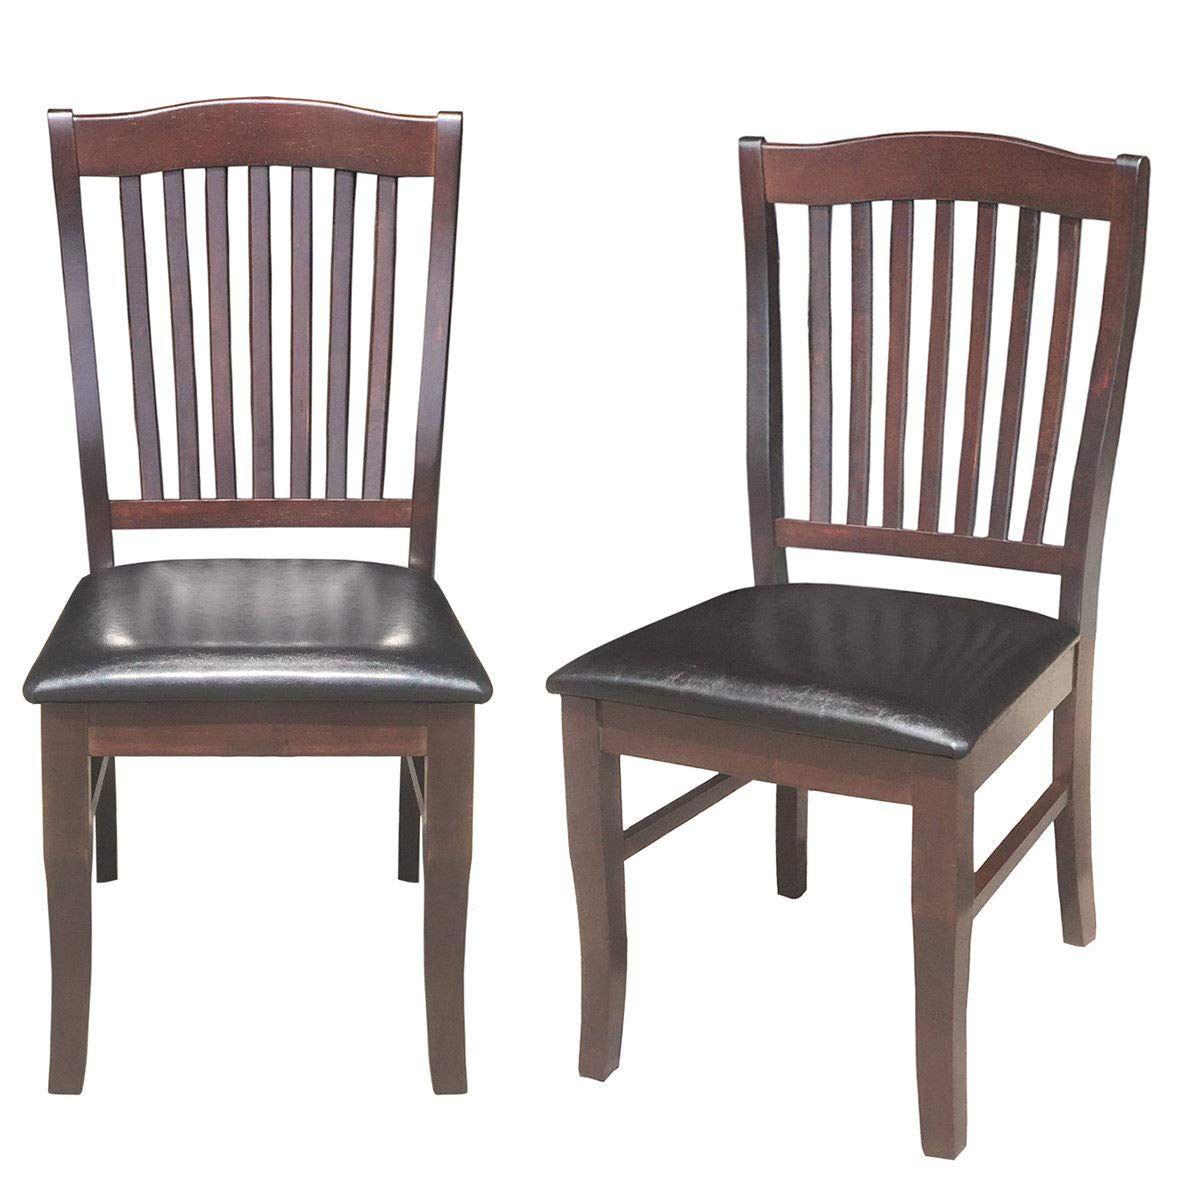 Ghp 2 Pcs 220 Lbs Capacity Black Wood Pu Upholstered Seat